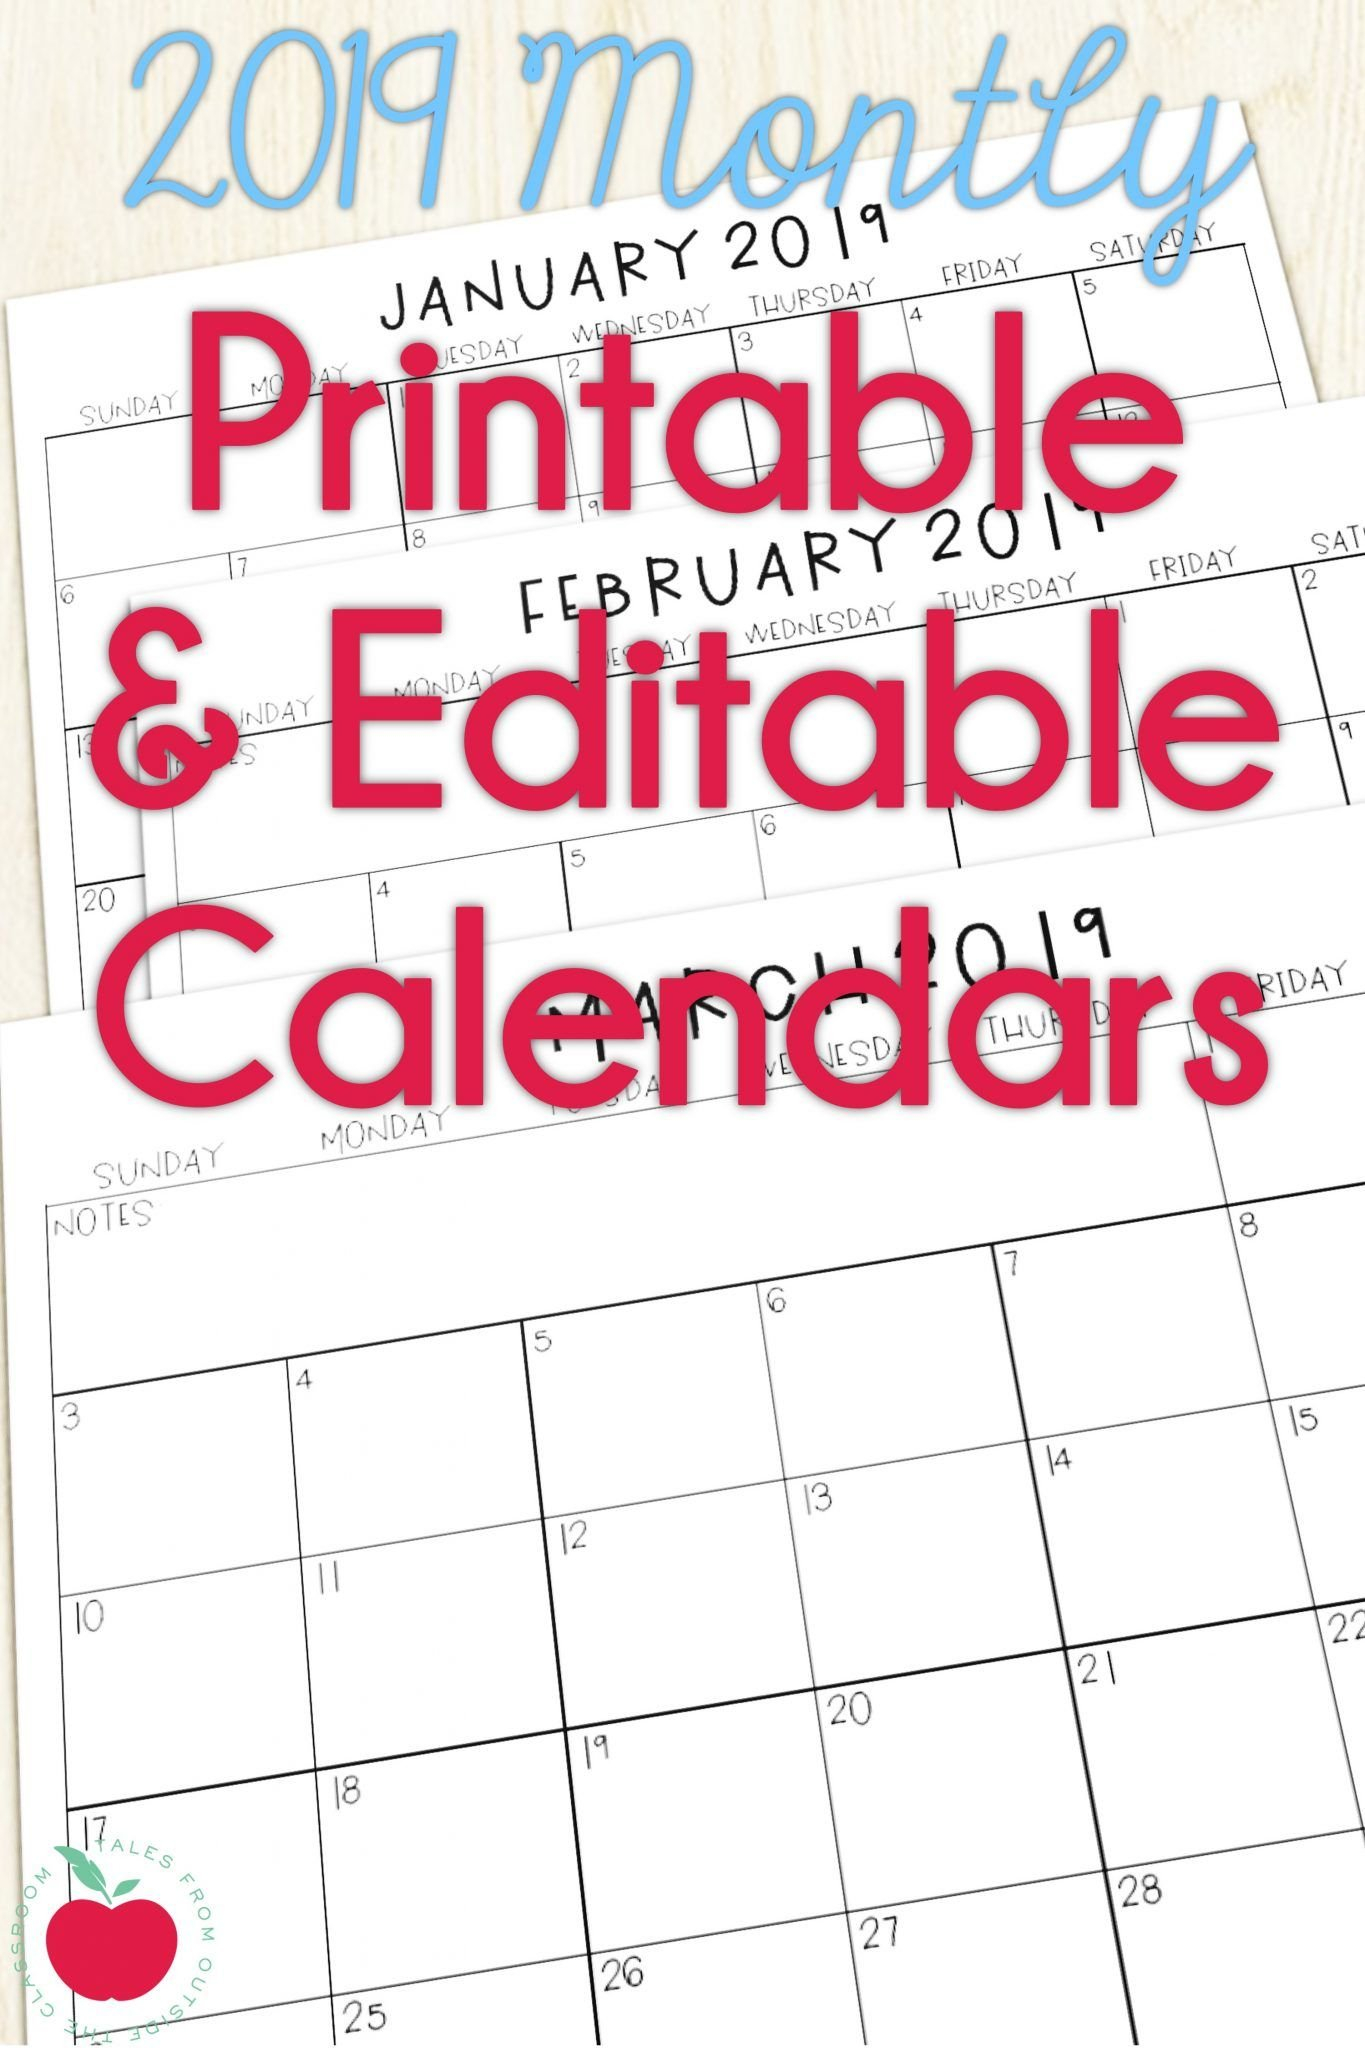 Blank Preschool Class Calendar   Example Calendar Printable Free Editable Preschool Calendar Template